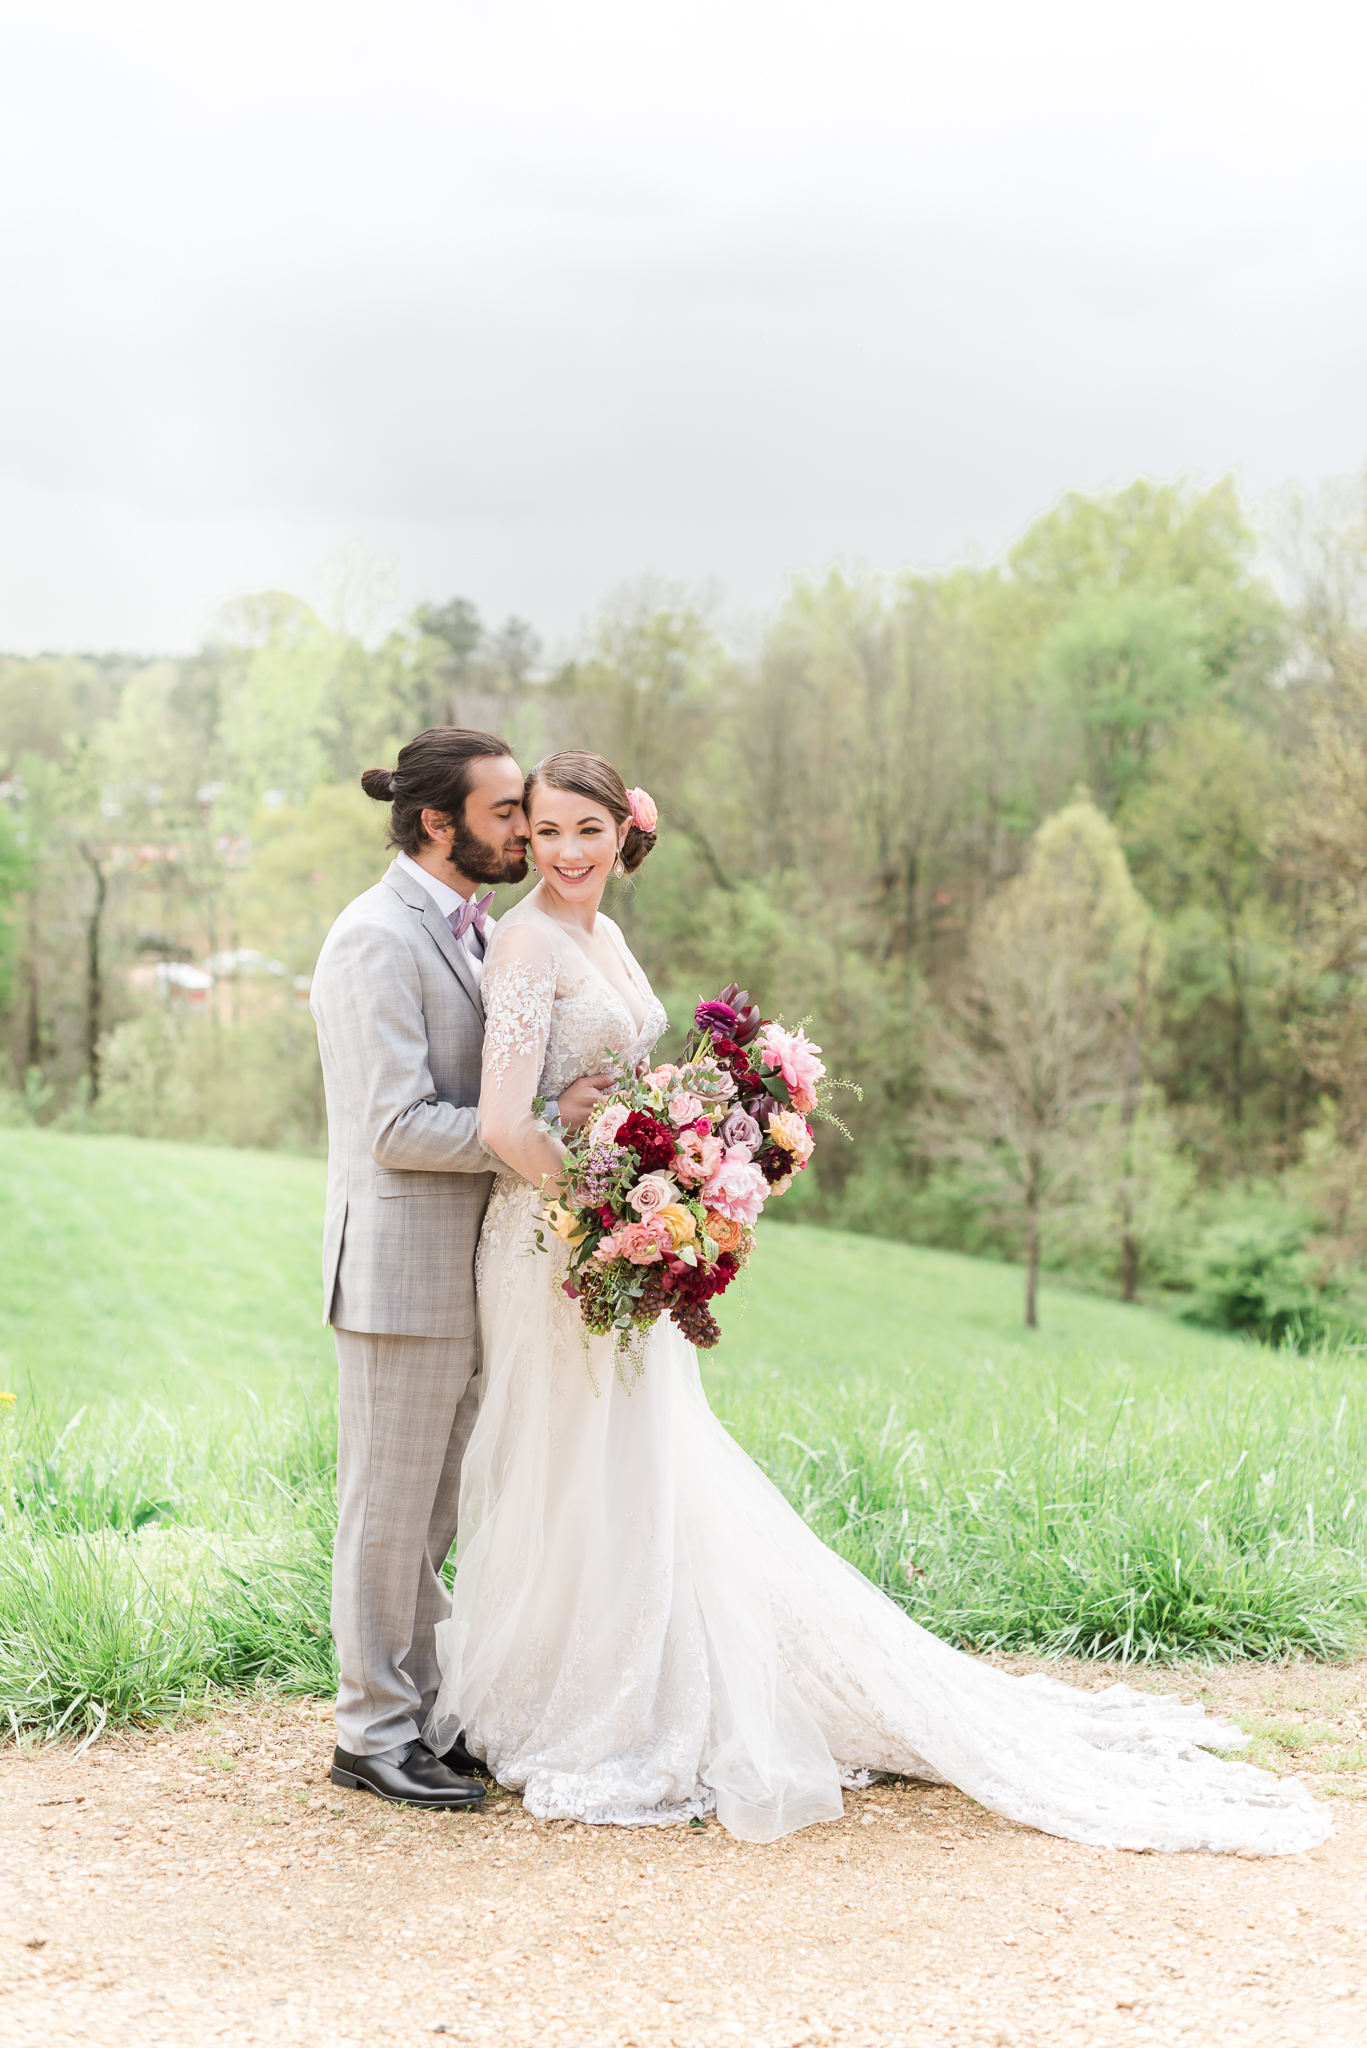 Luxury Greenhouse Wedding Atlanta Wedding Photographer 2400 on the River-45.jpg